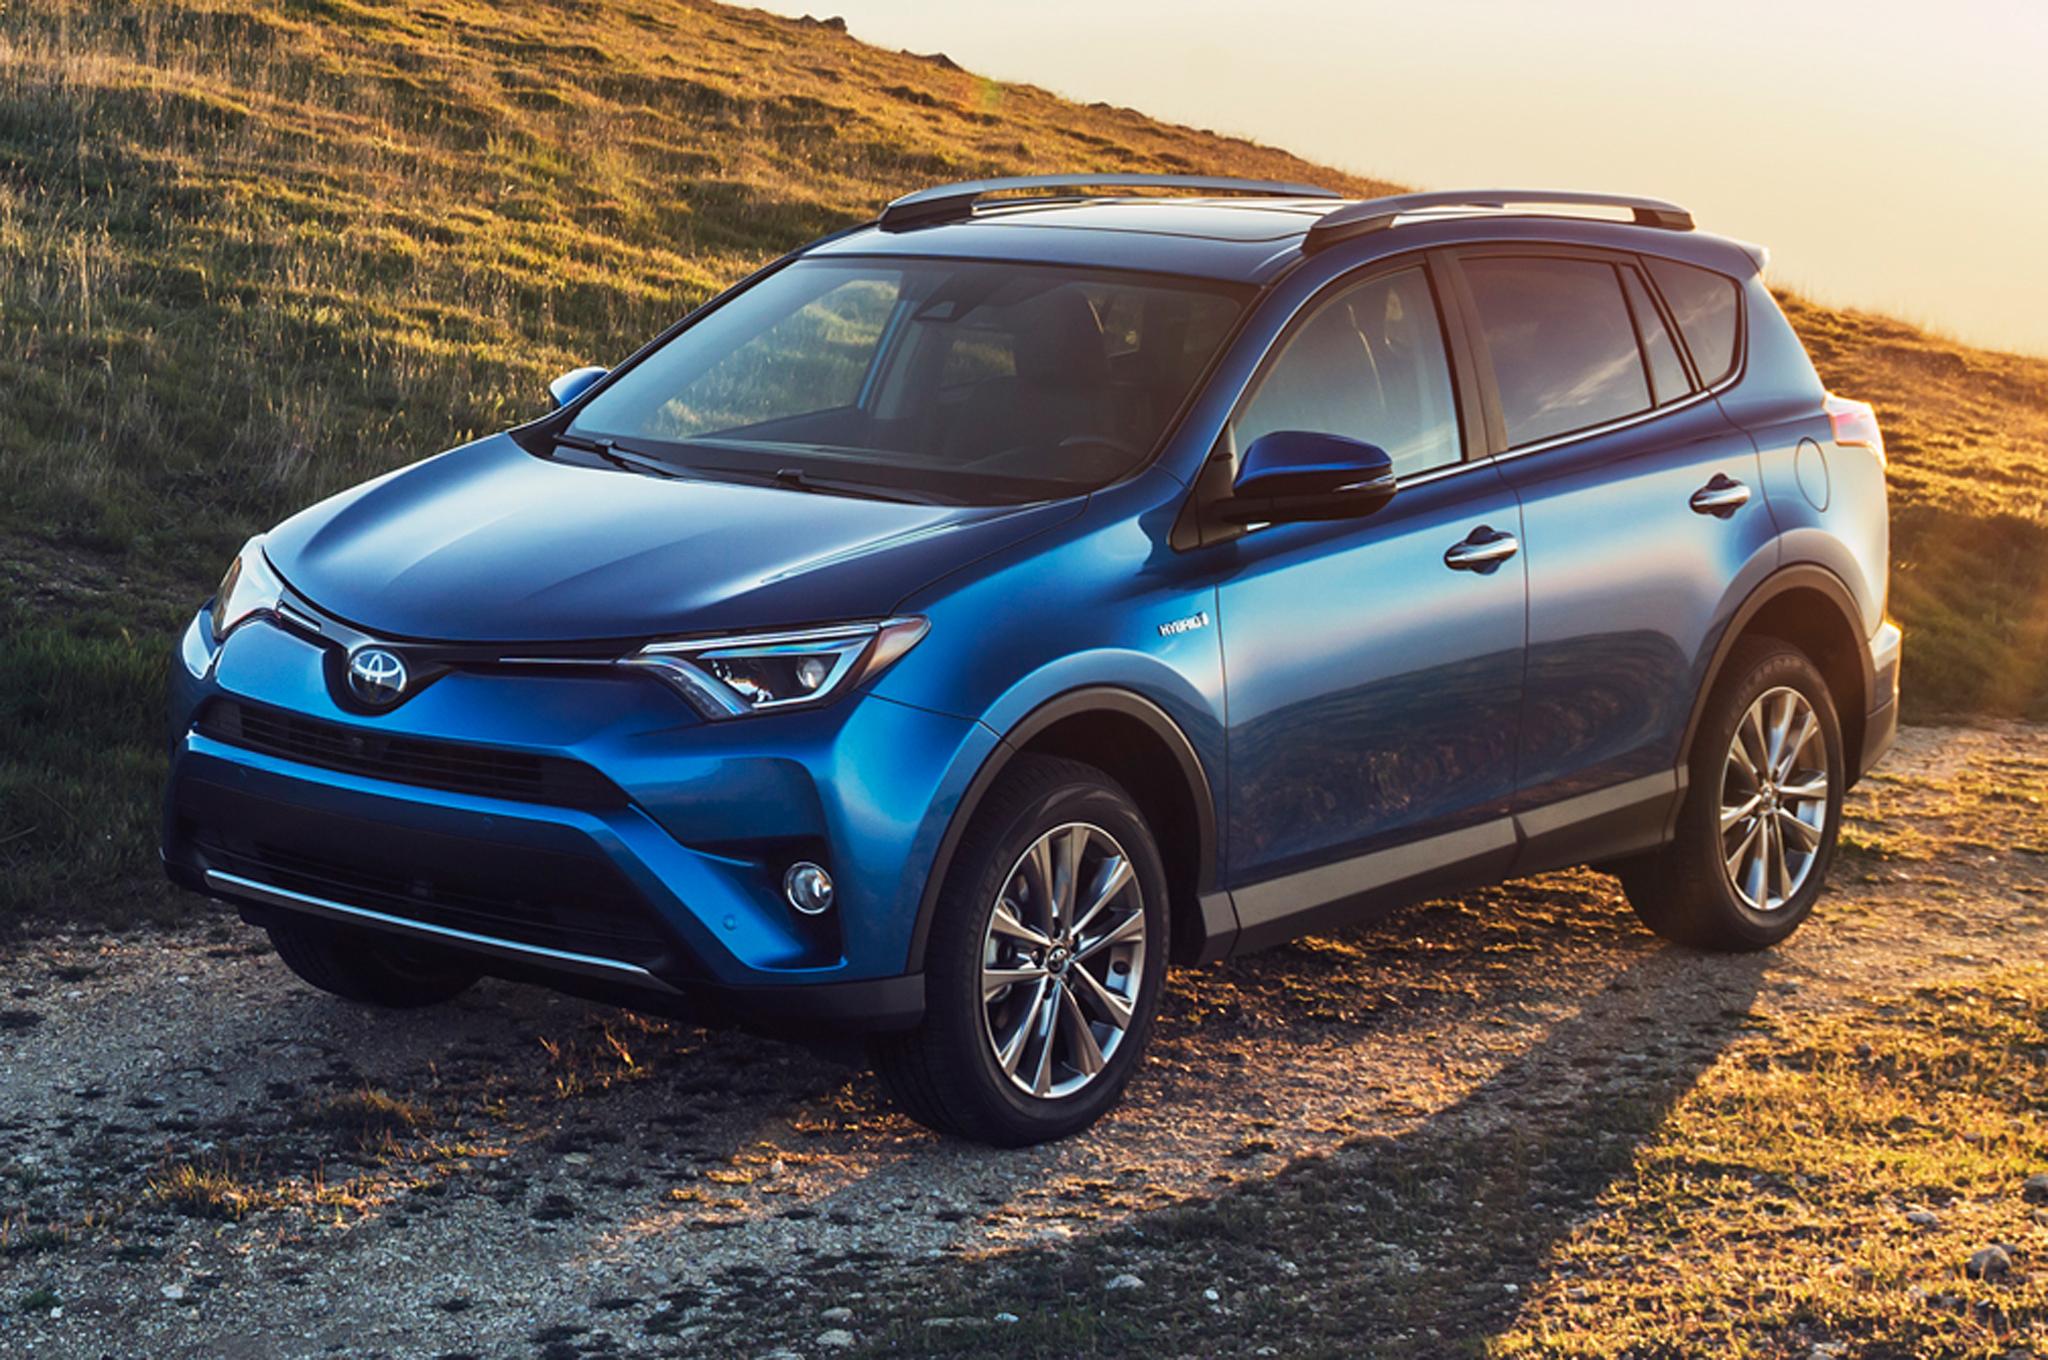 2016-Toyota-RAV4-SUV-New-Car-.jpg